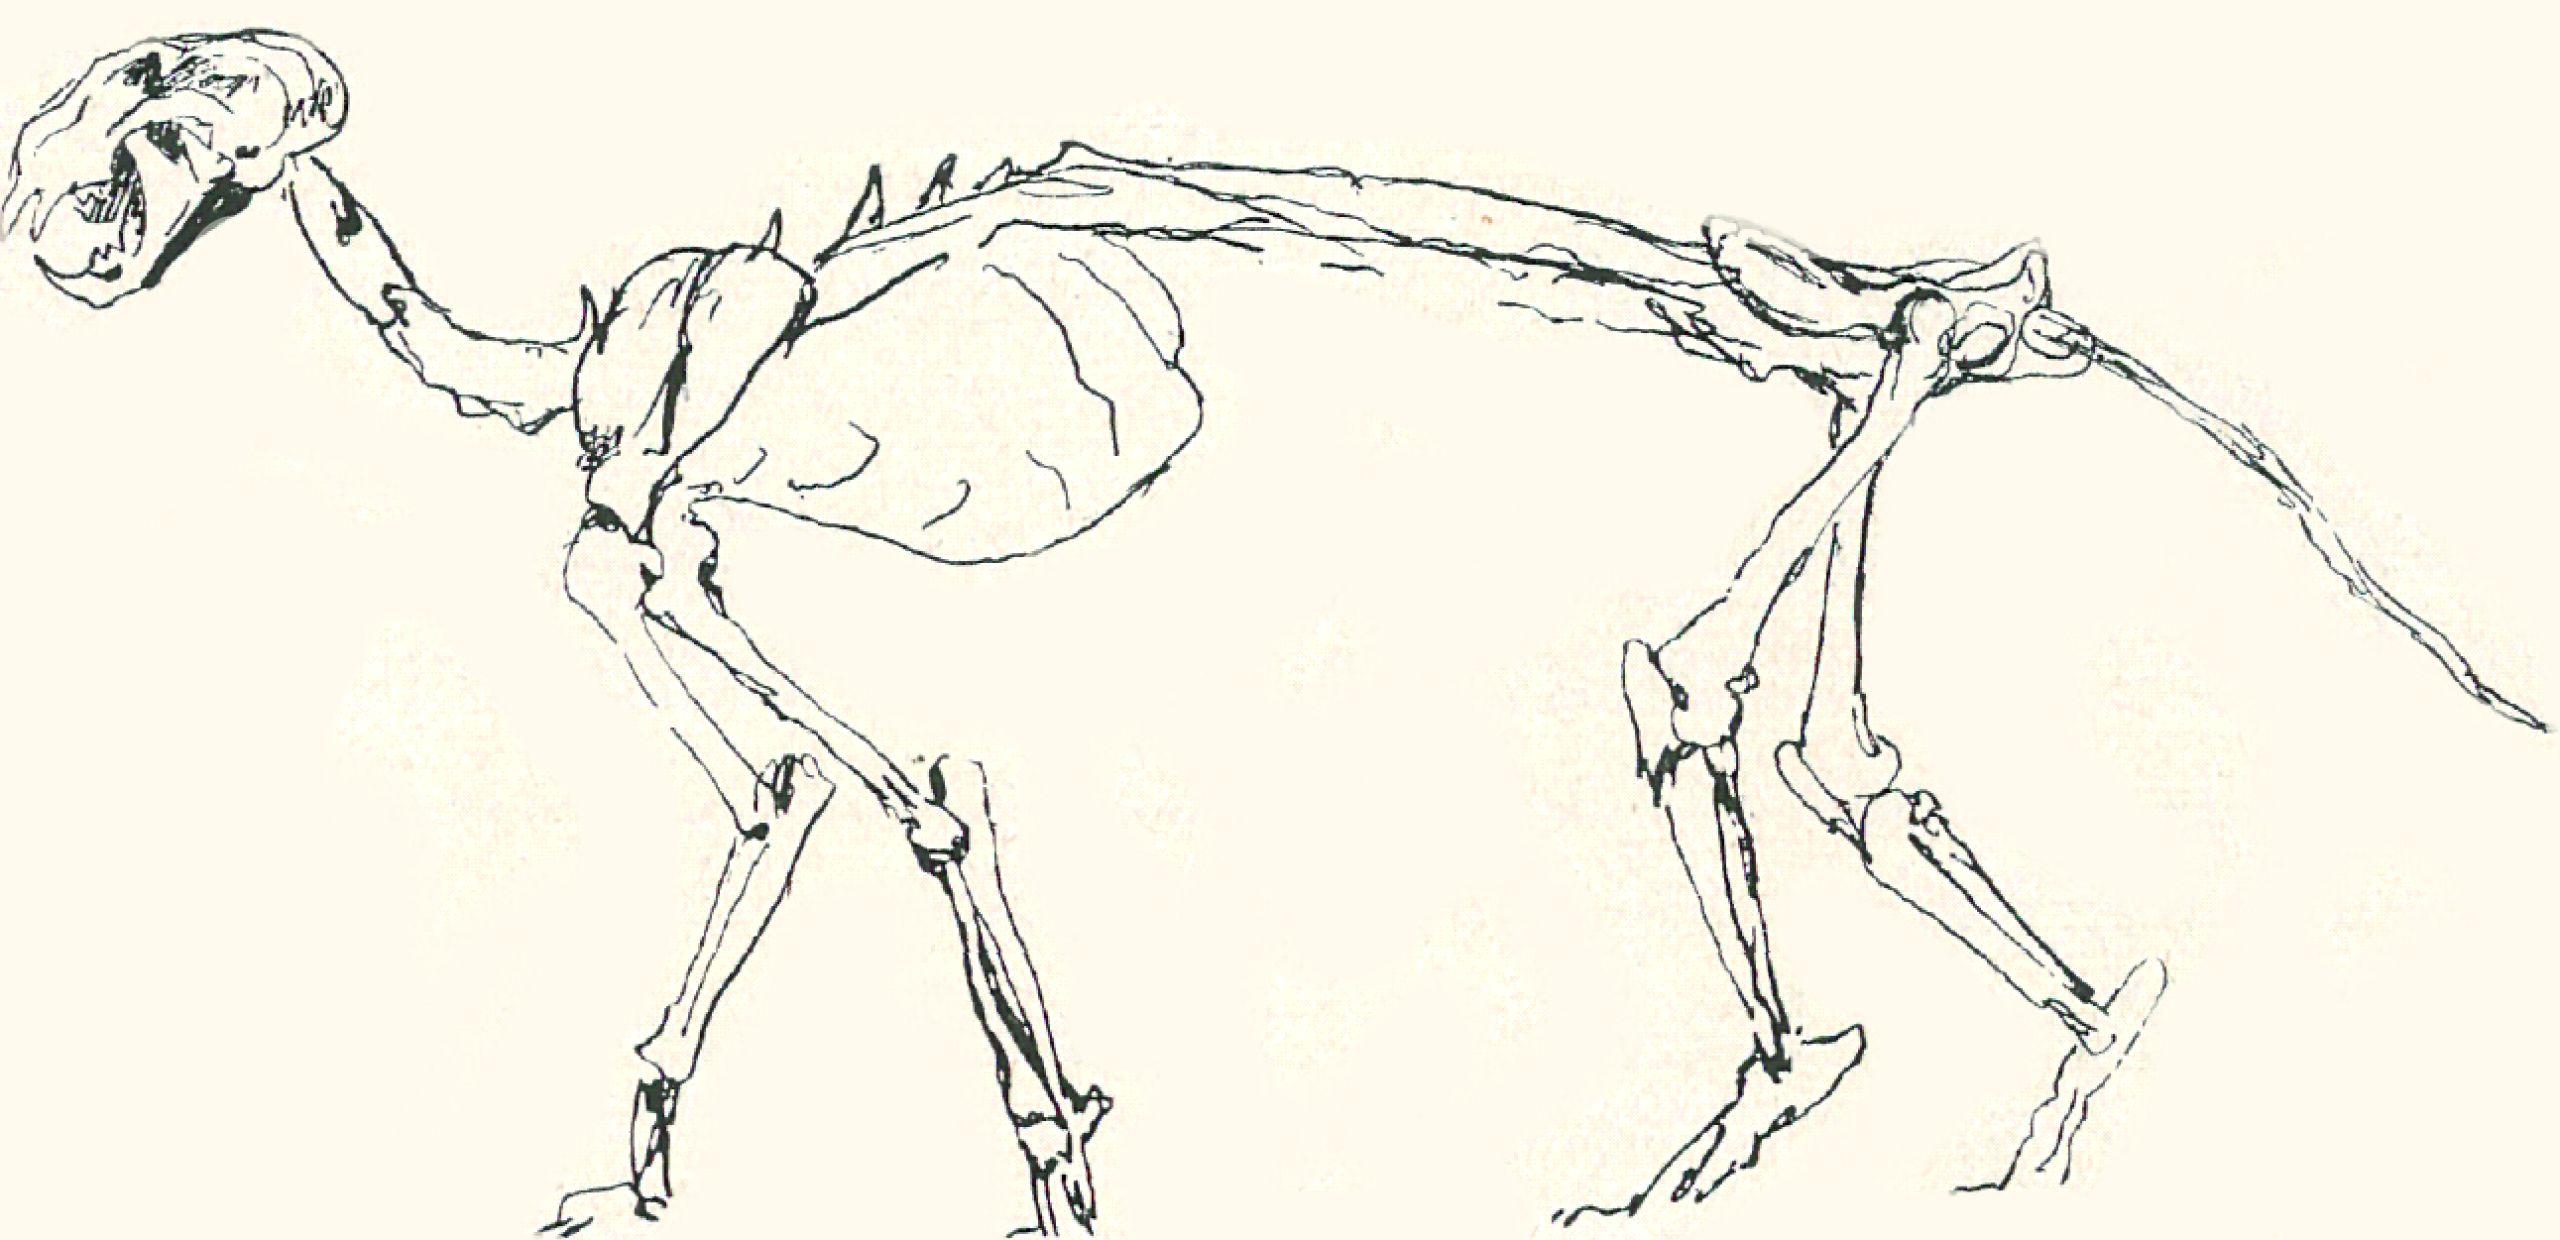 Skelett einer Katze - Zeno.org